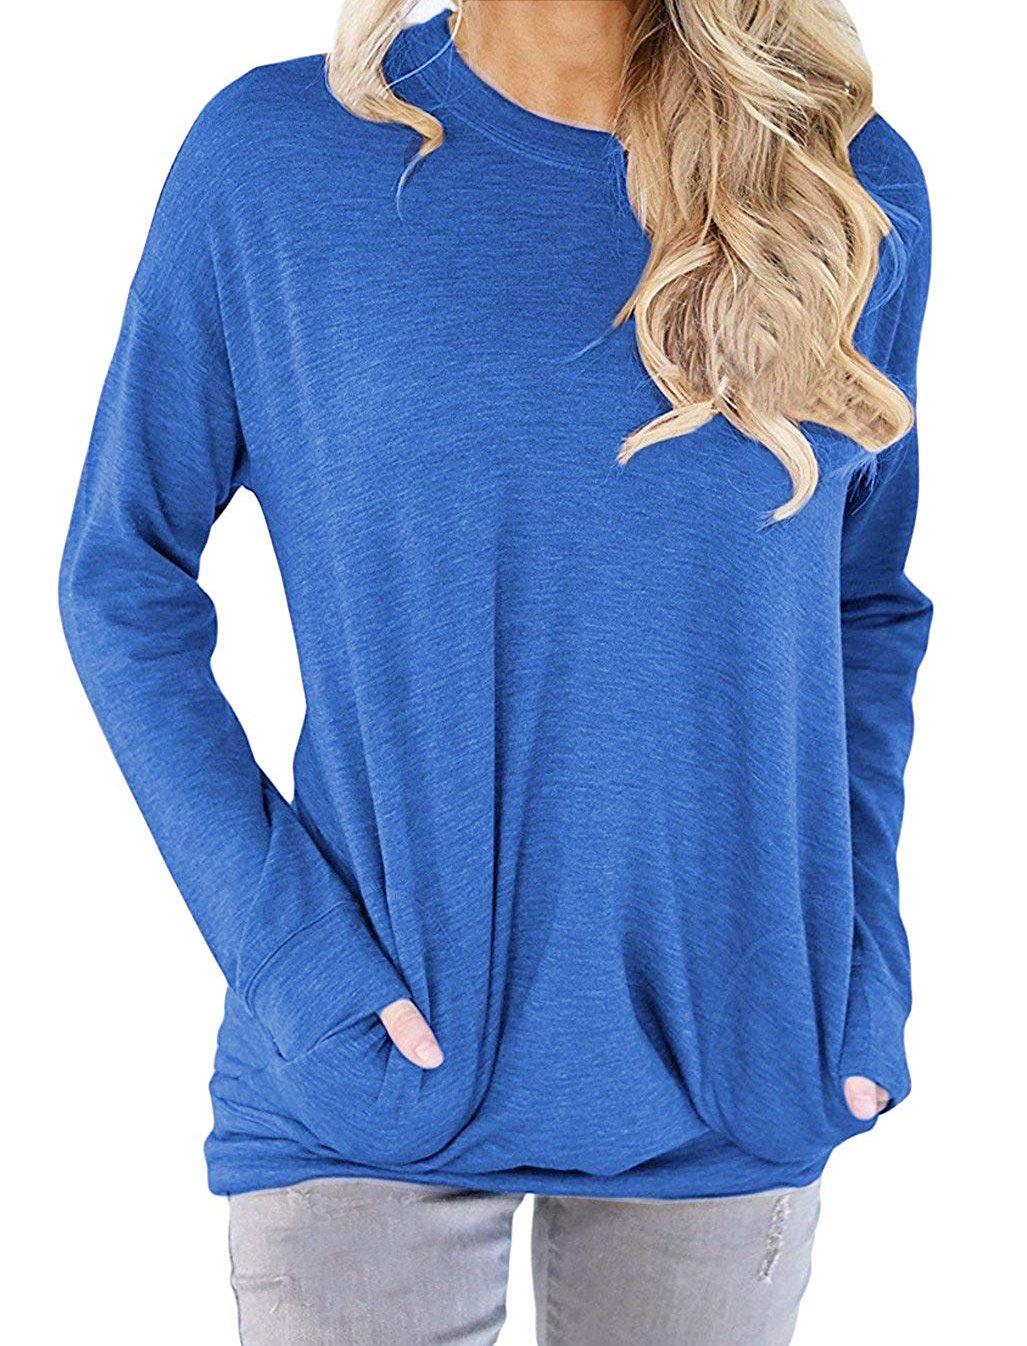 GSVIBK Women Casual Round Neck Sweatshirts Long Sleeve Pullover Shirts Tops Soft Sweatshirts Blouse Pocket Blue XL